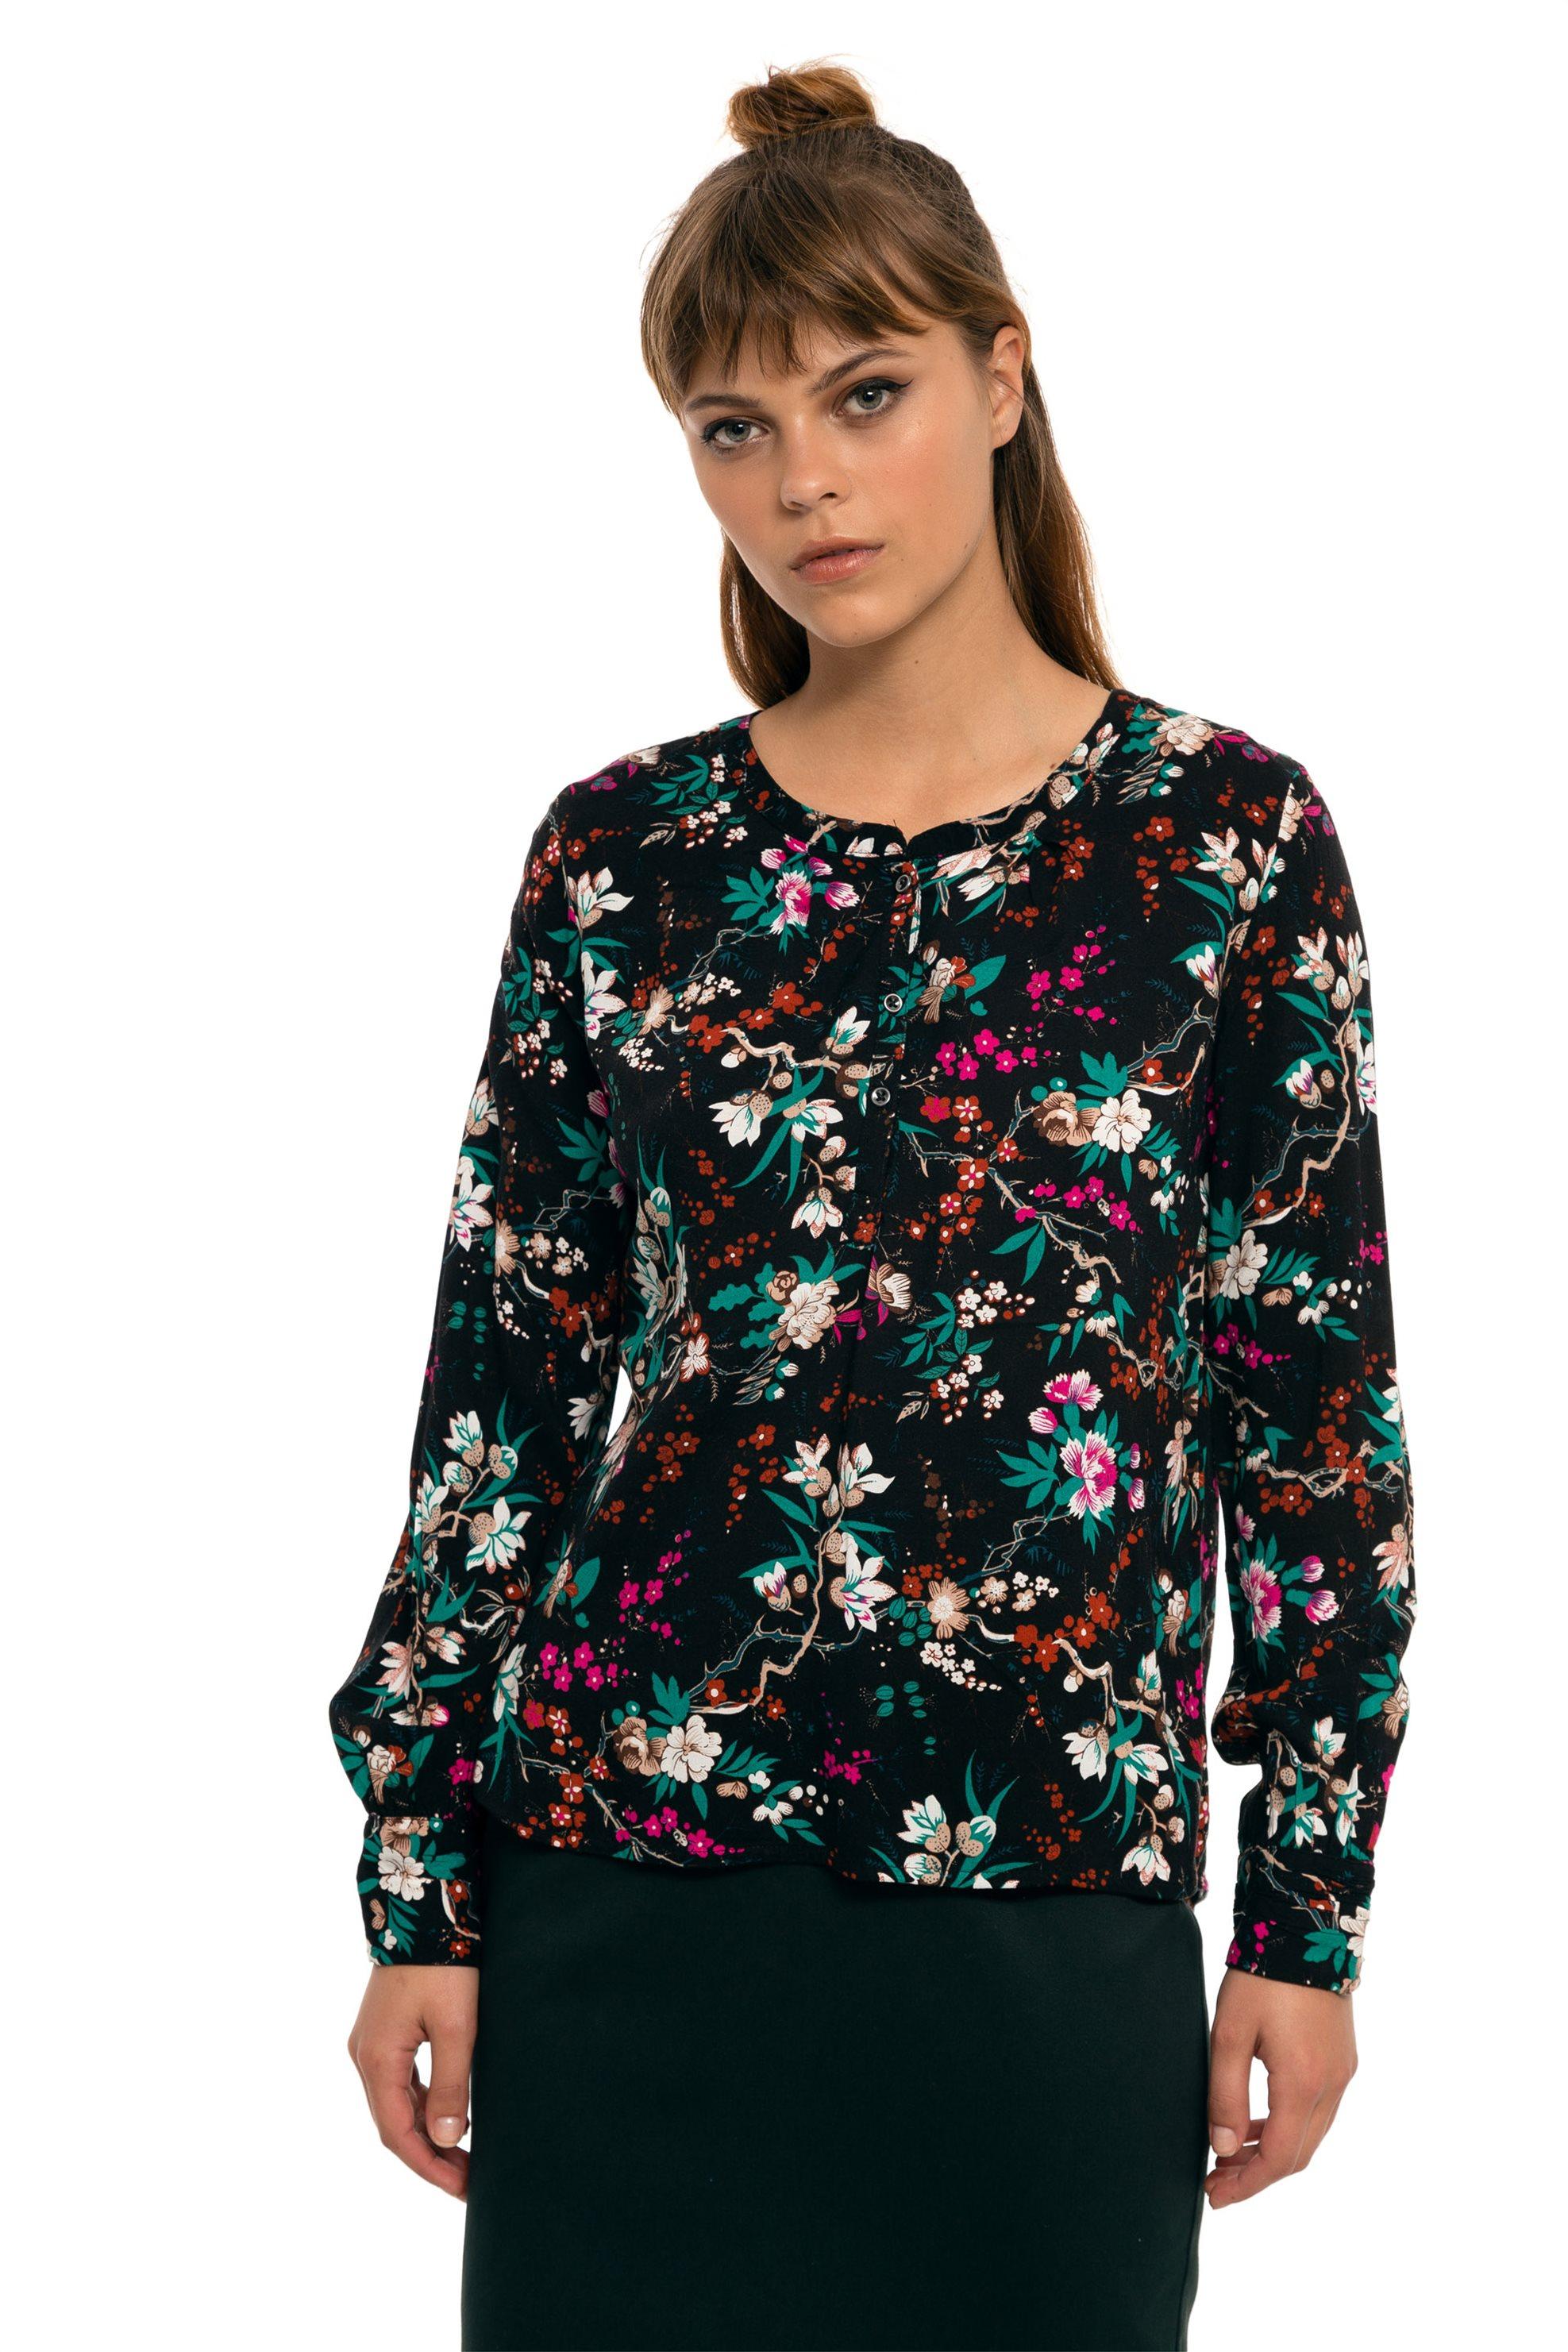 Fransa γυναικεία πουκαμίσα εμπριμέ - 20604603 - Μαύρο γυναικα   ρουχα   tops   πουκάμισα   μπλούζες   πουκαμίσες   καφτάνια   casual